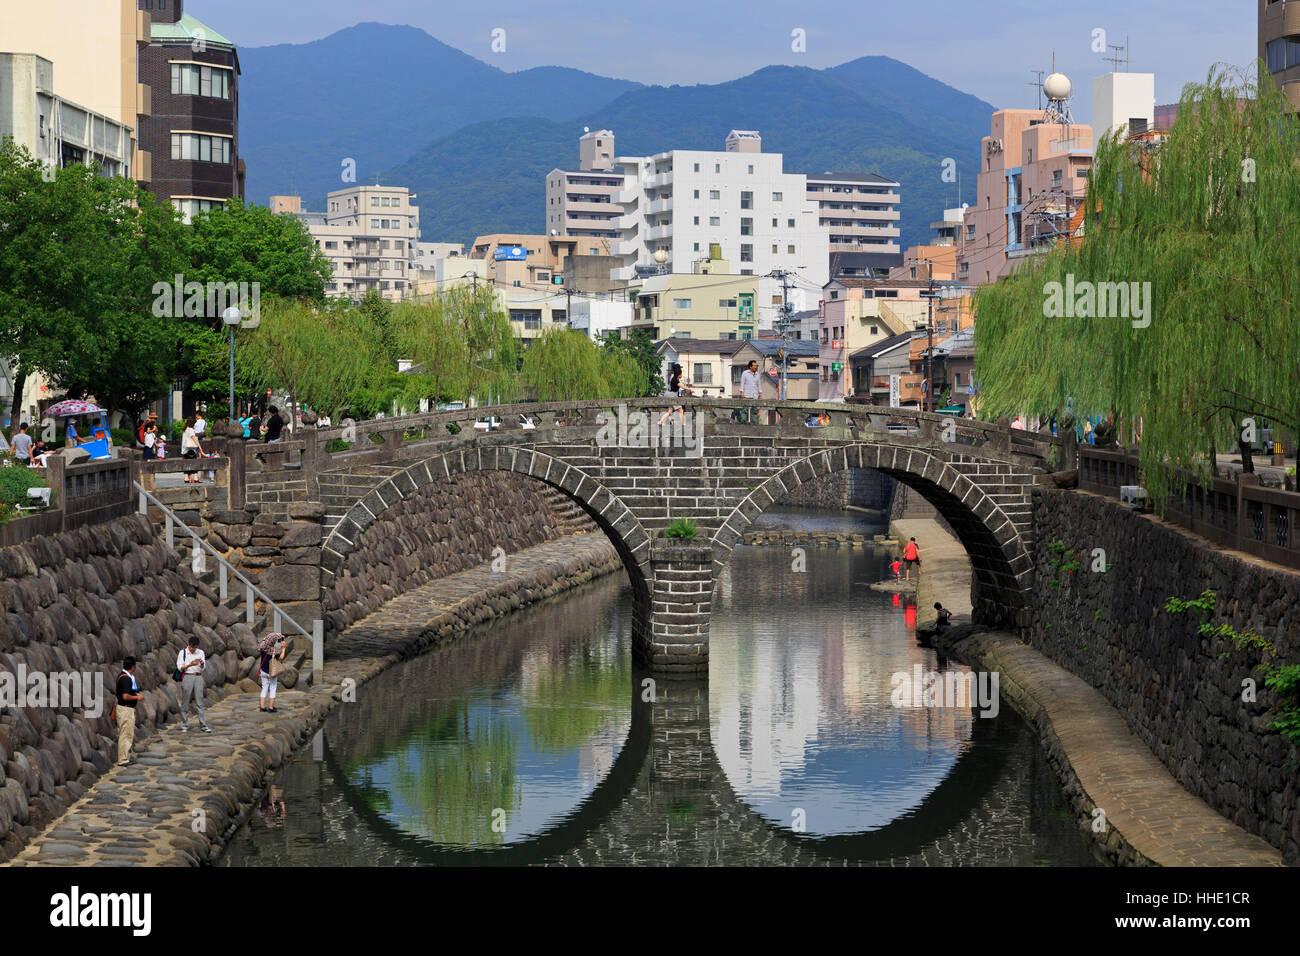 Spectacles Bridge, Nakashima River, Nagasaki, Kyushu Island, Japan - Stock Image